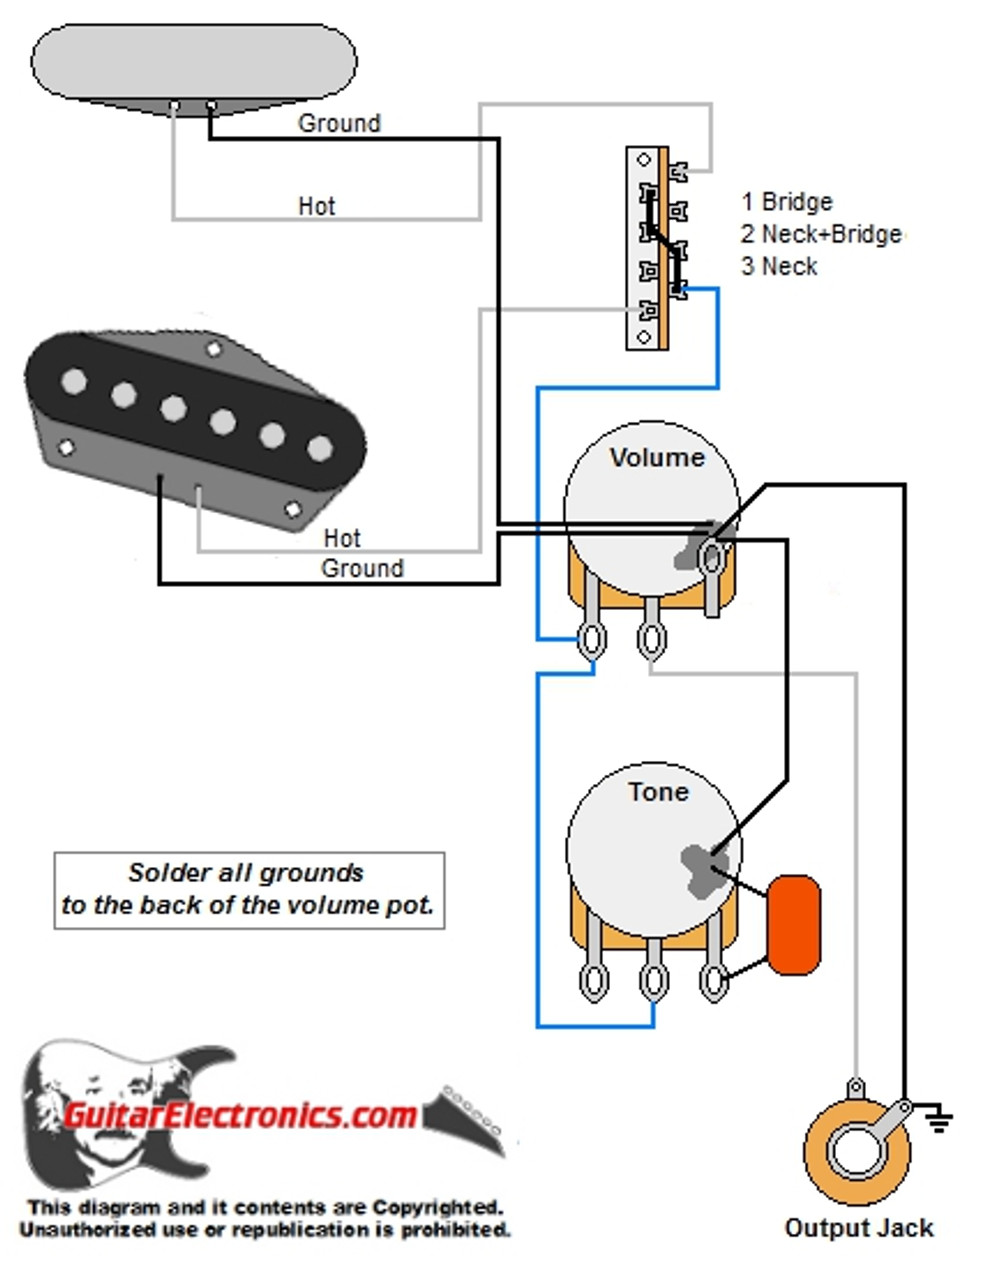 tele style guitar wiring diagram Single Coil Pickup Wiring Diagrams